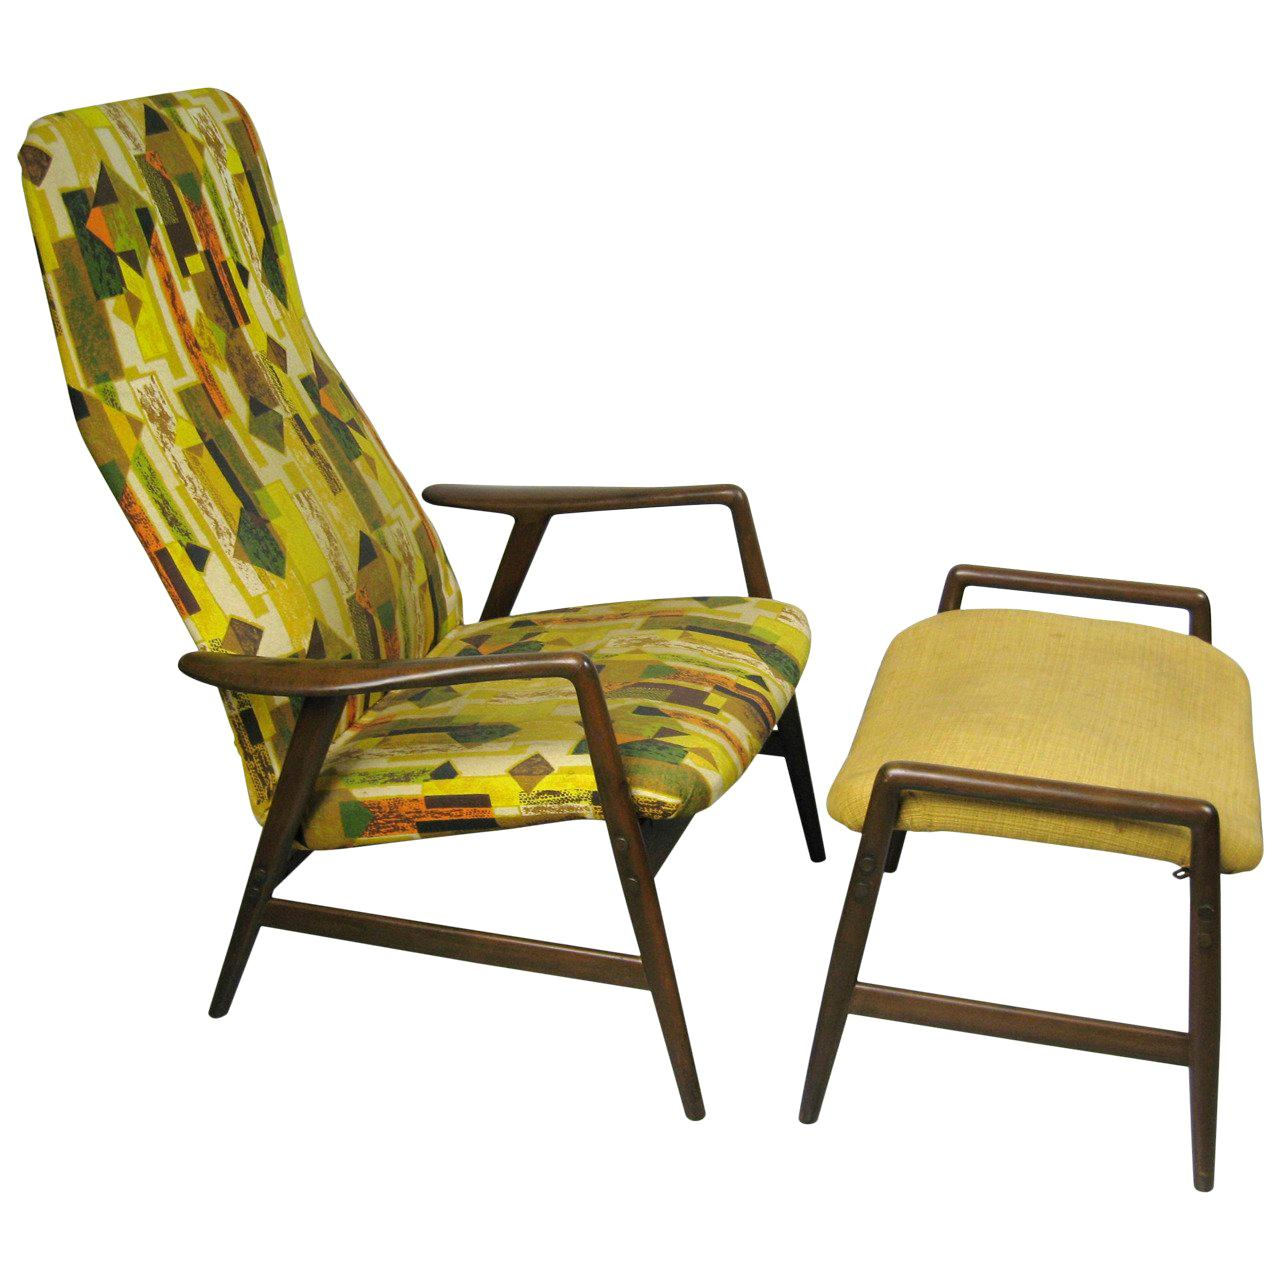 Folke Ohlsson DUX Reclining Chair with Ottoman, Mid-Century Modern